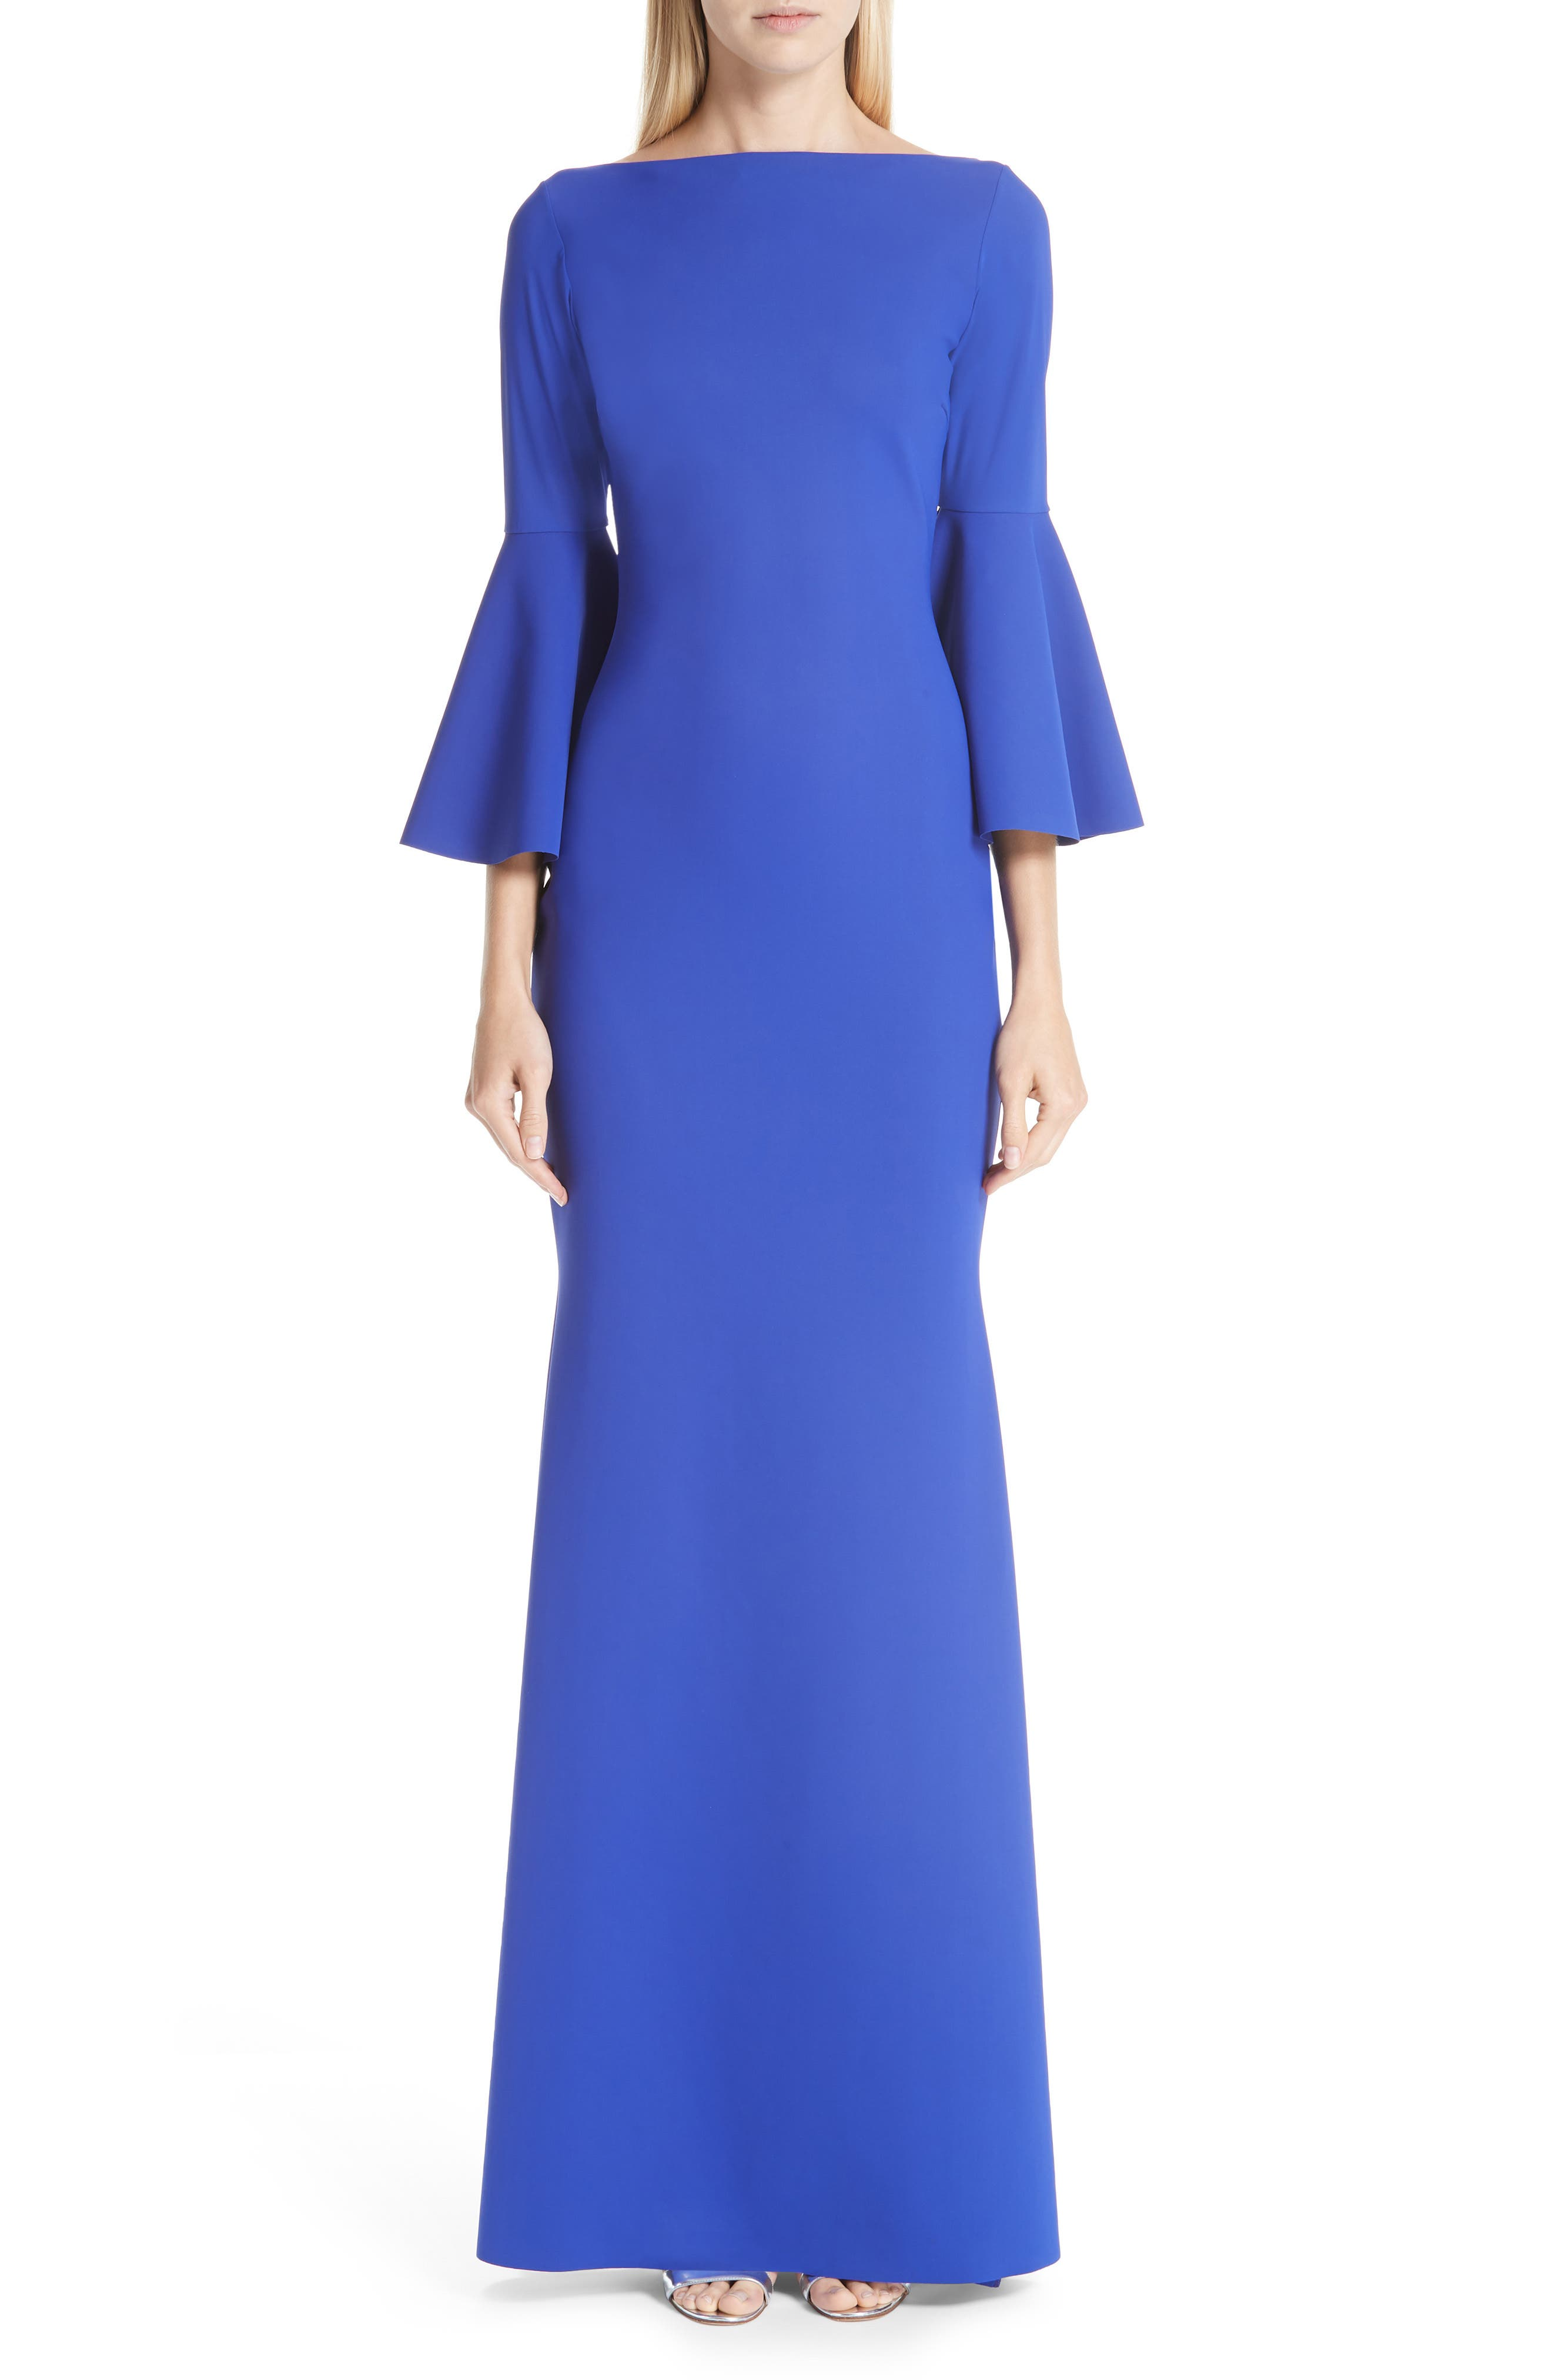 Chiara Boni La Petite Robe Iva Bell Sleeve Evening Dress, 8 IT - Blue